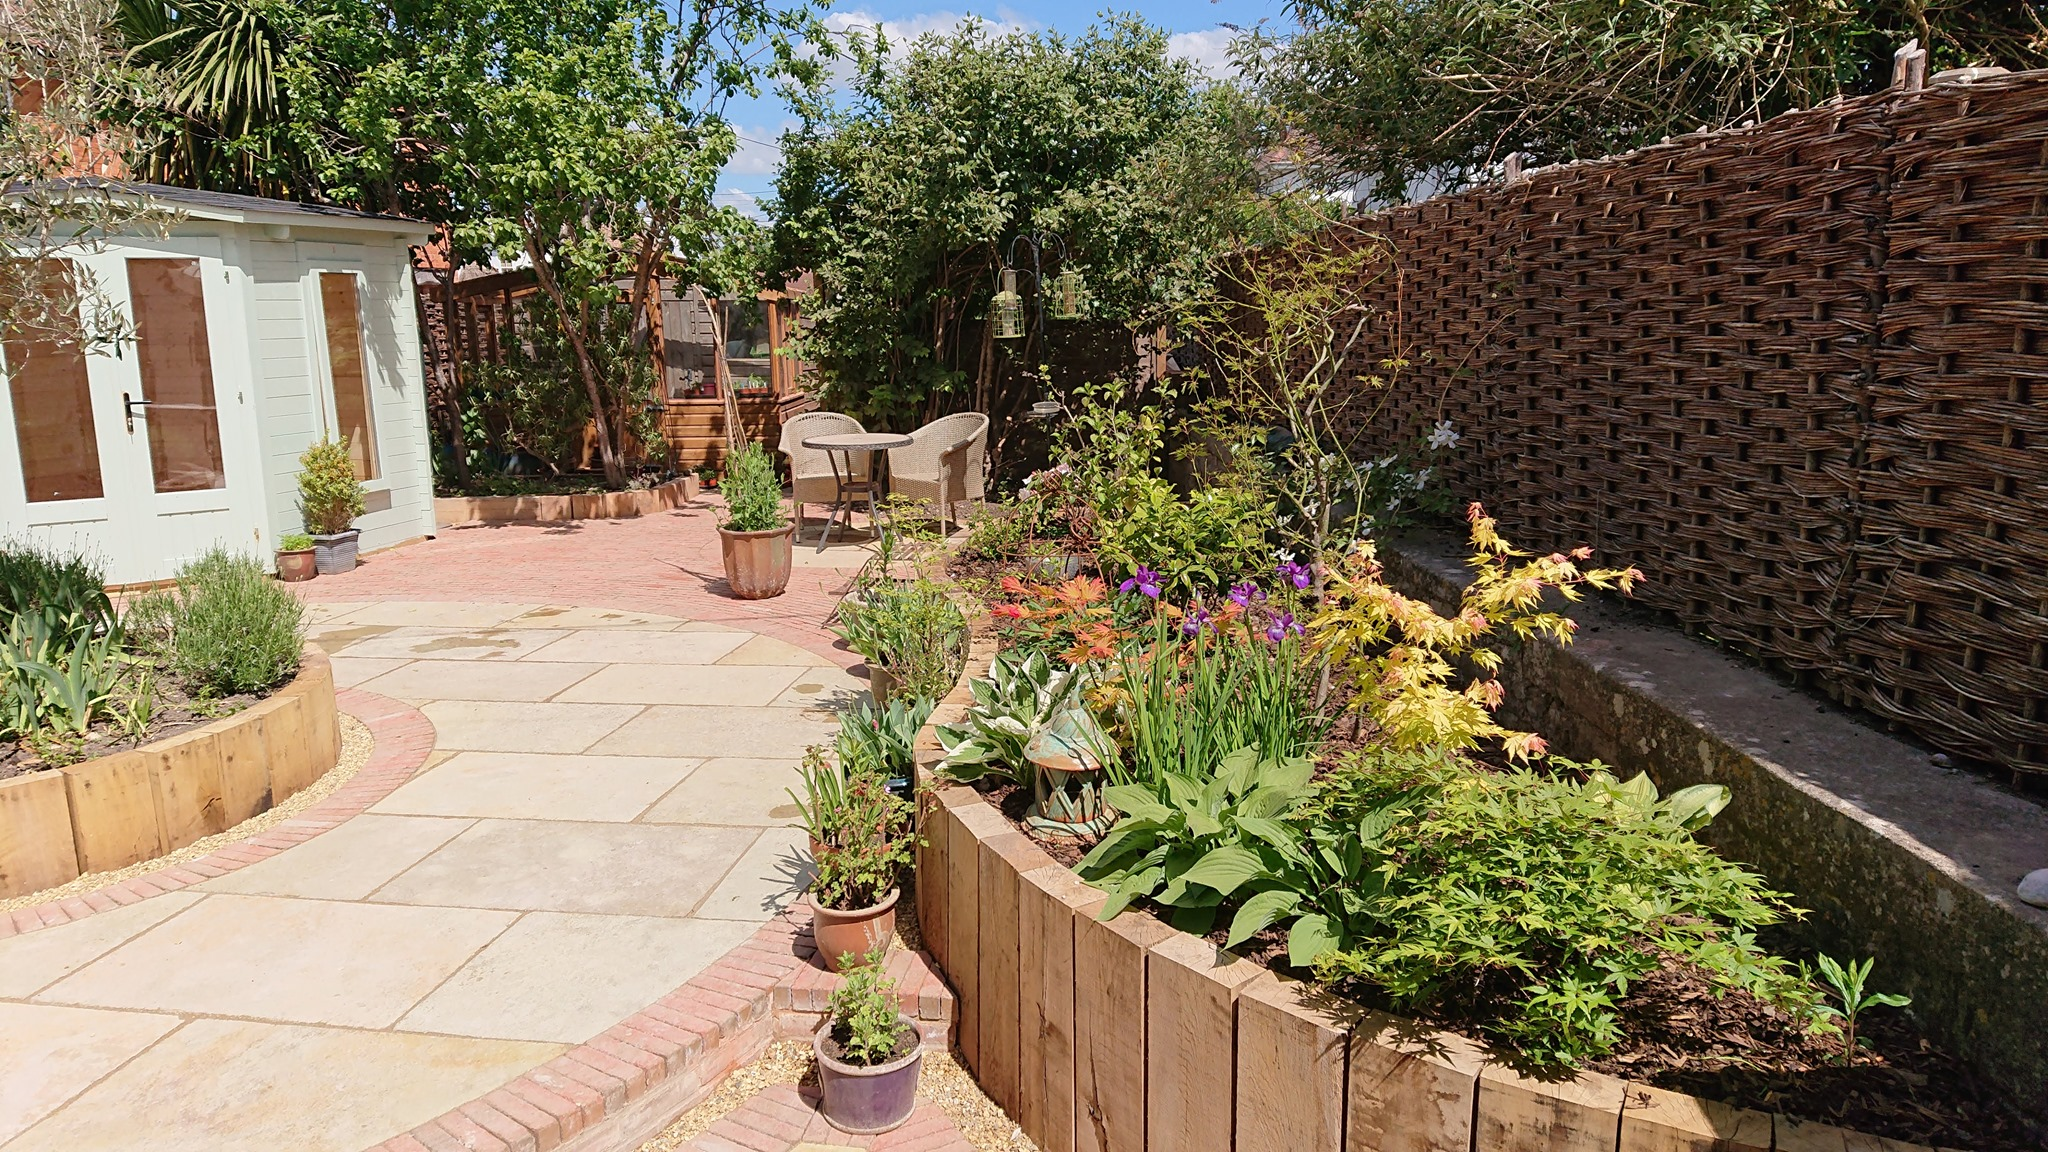 How to design a garden without grass - SilverBirch Gardens